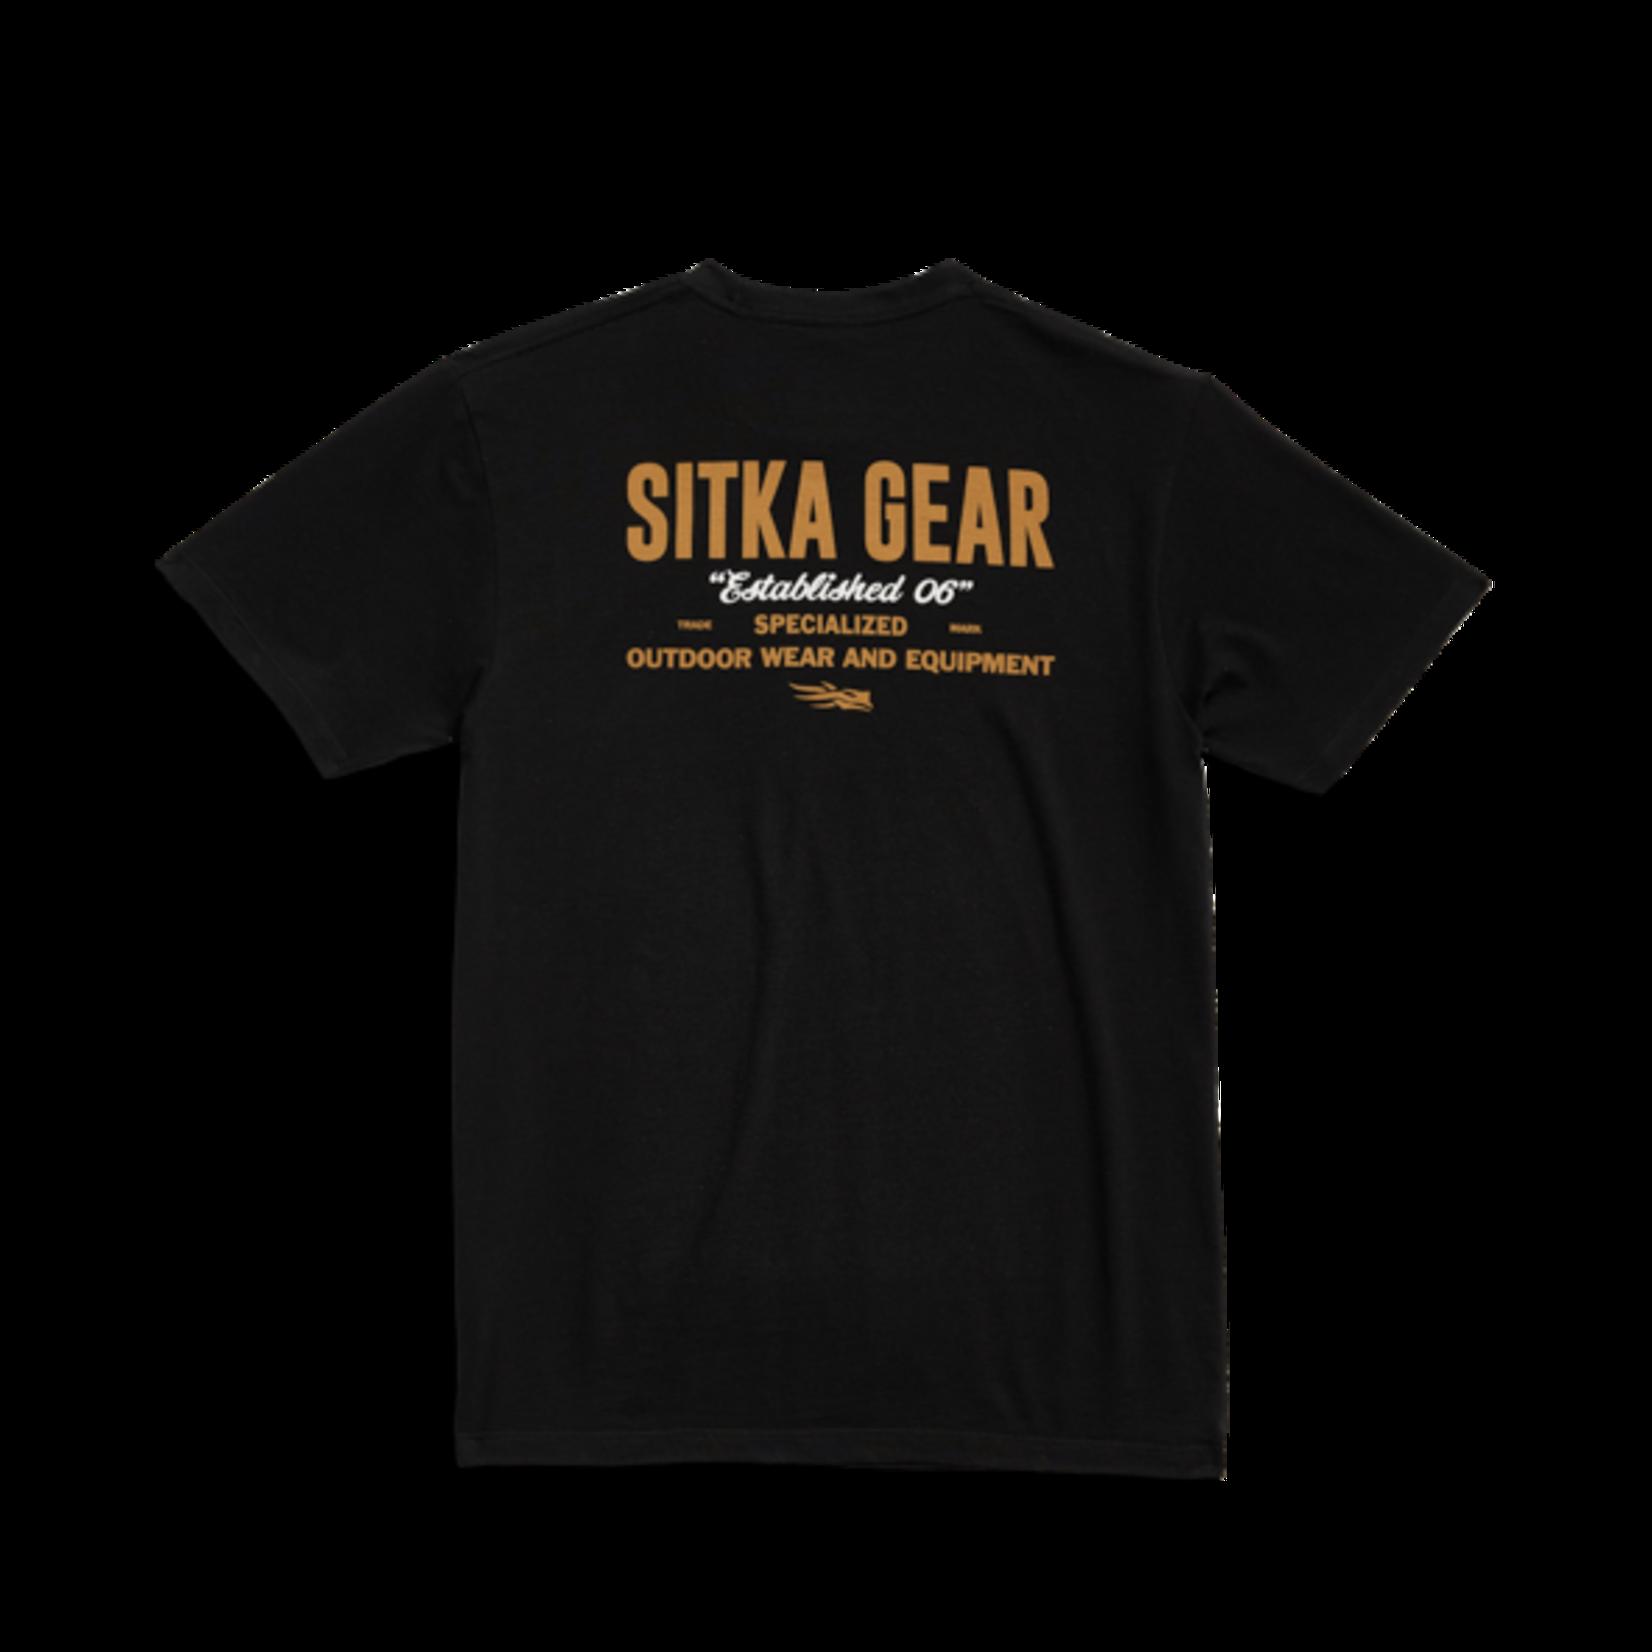 Sitka Gear Signage Tee